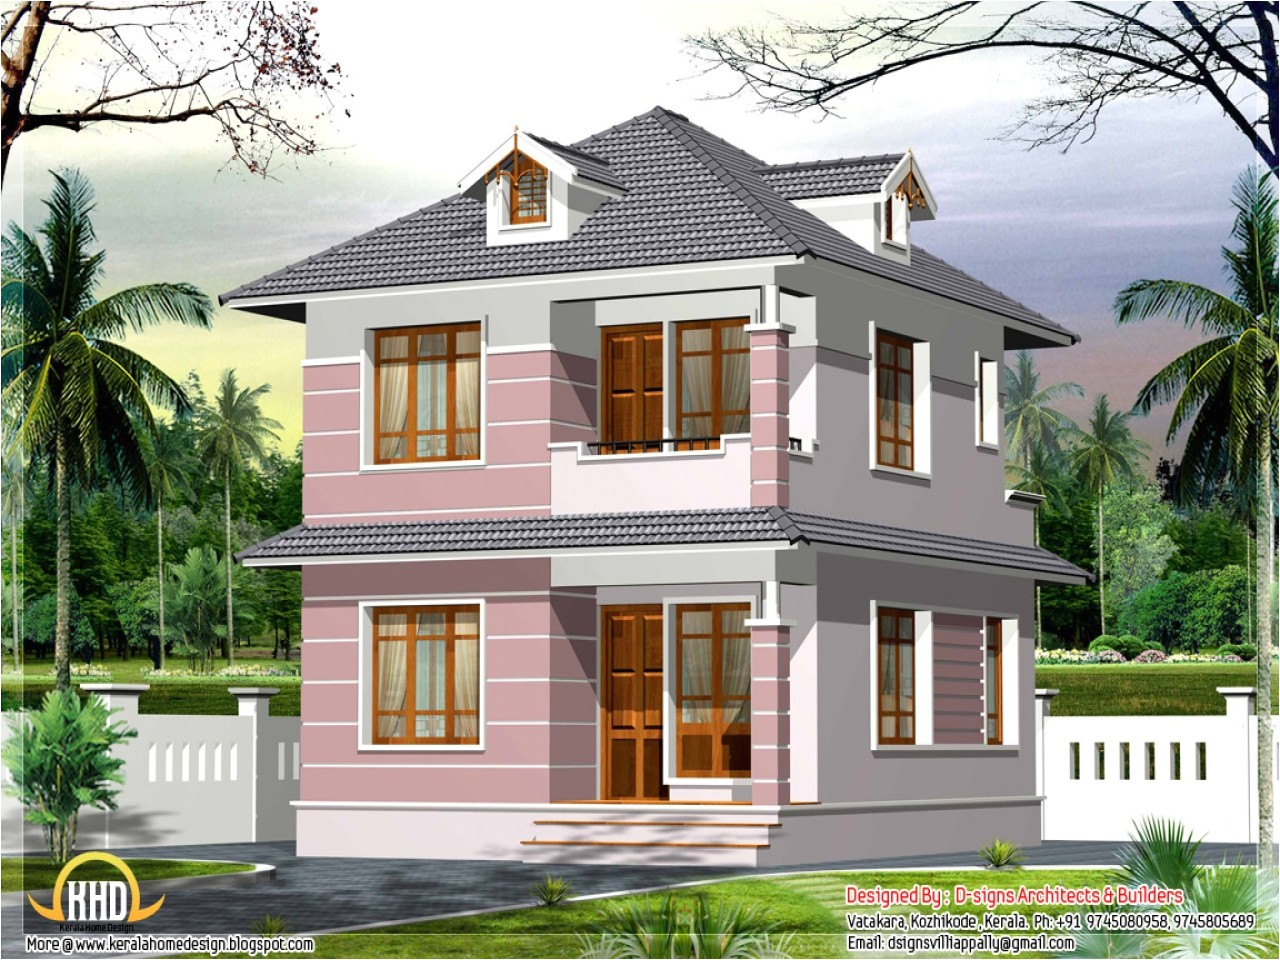 Masonry Home Plans Small Concrete Block Home Plans